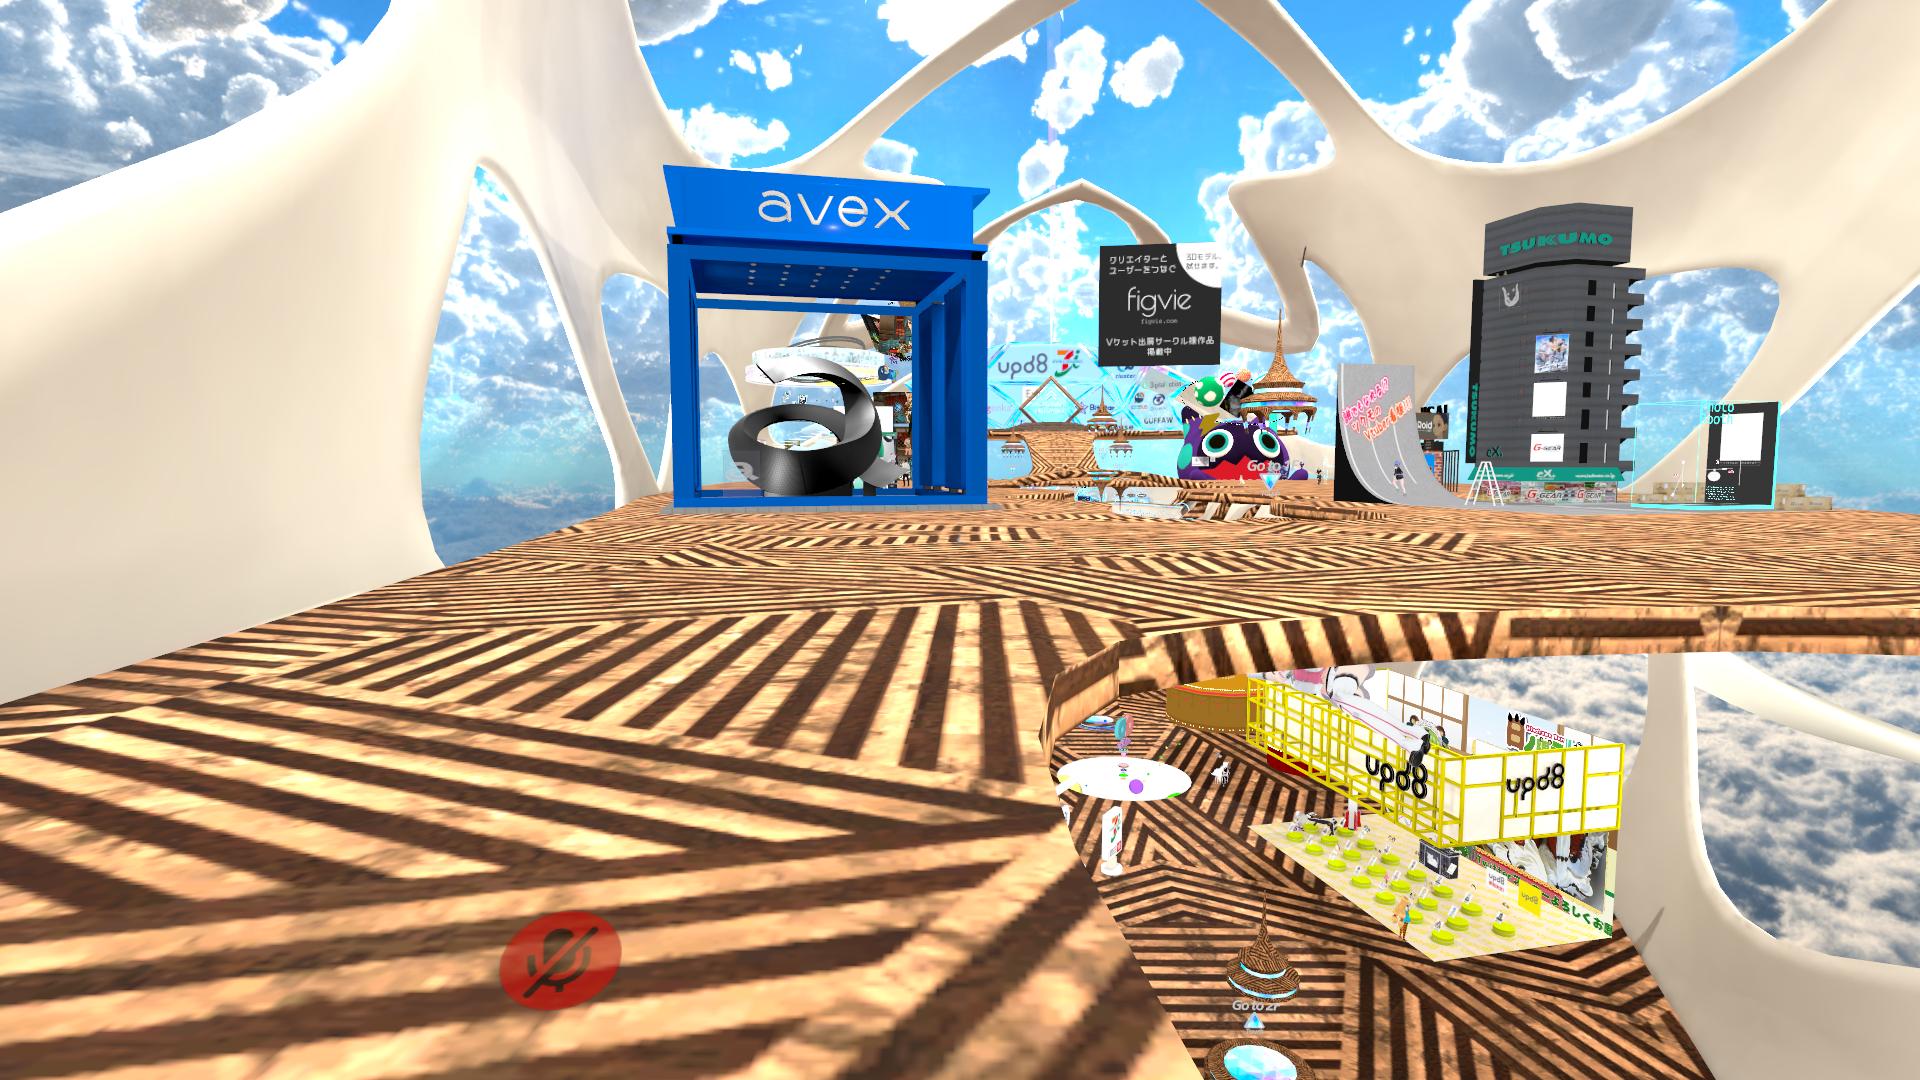 Virtual Market 2 [VRChat] |